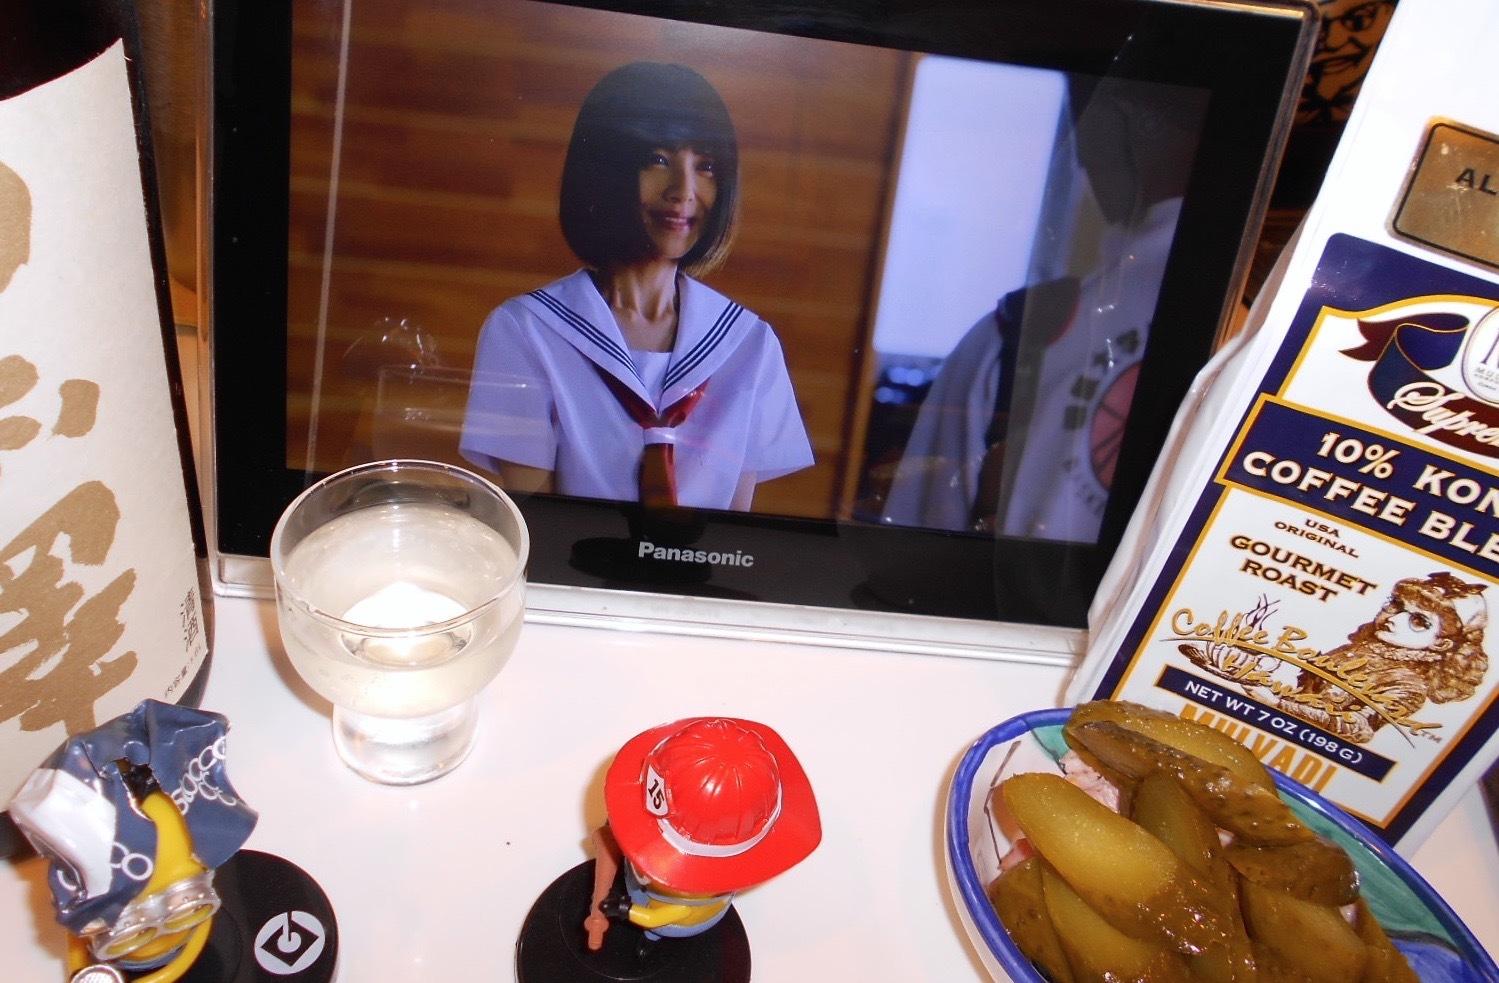 kurosawa_hozumi29by5_16.jpg